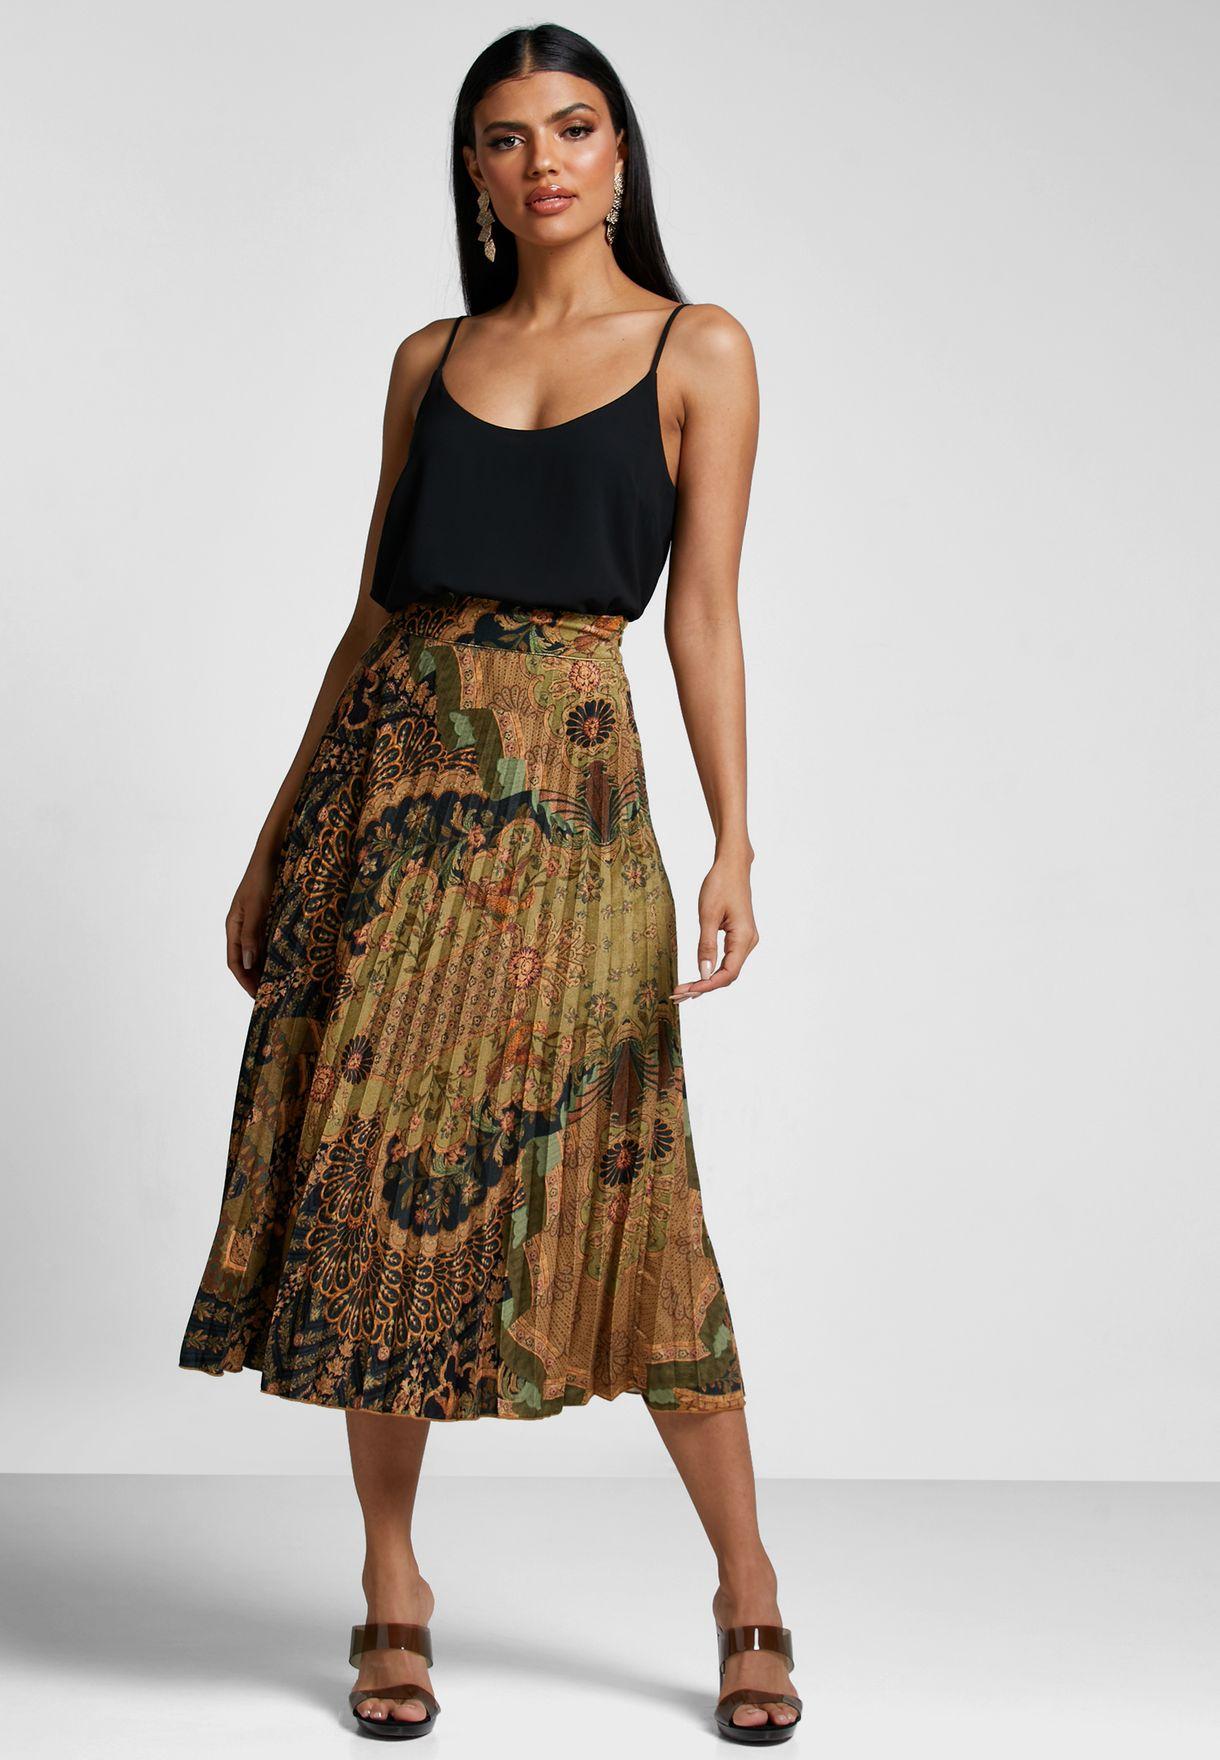 Pleated Embellished Skirt